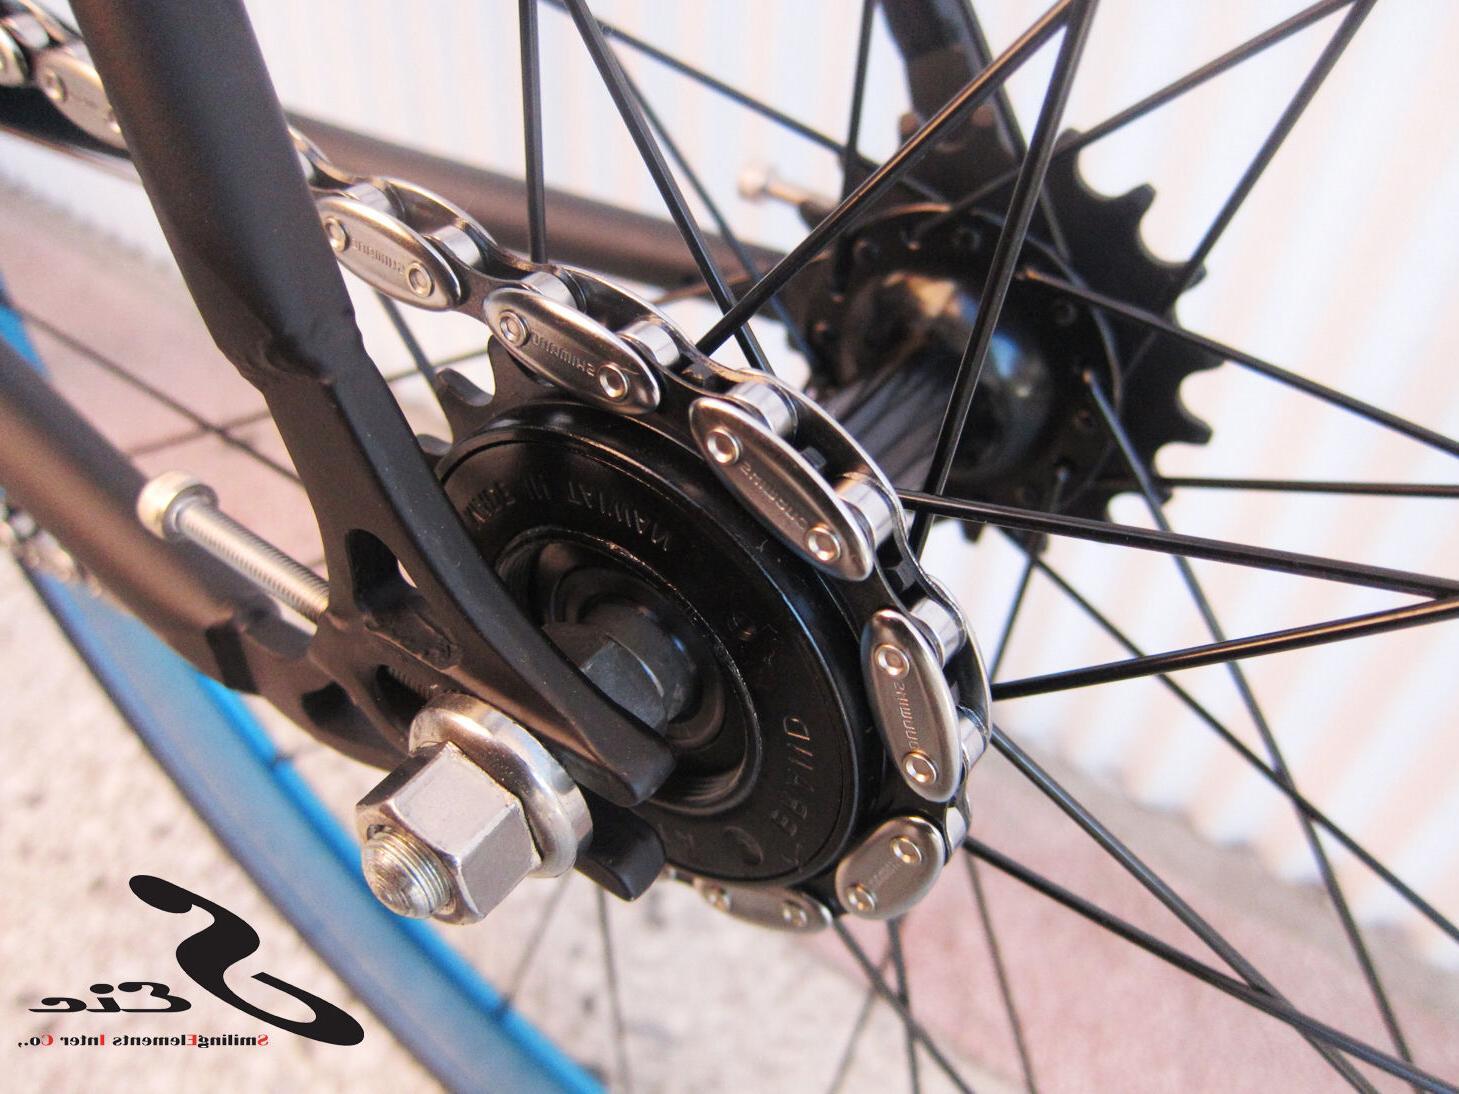 Shimano CN-NX01 Bike + Master Fixed 98L